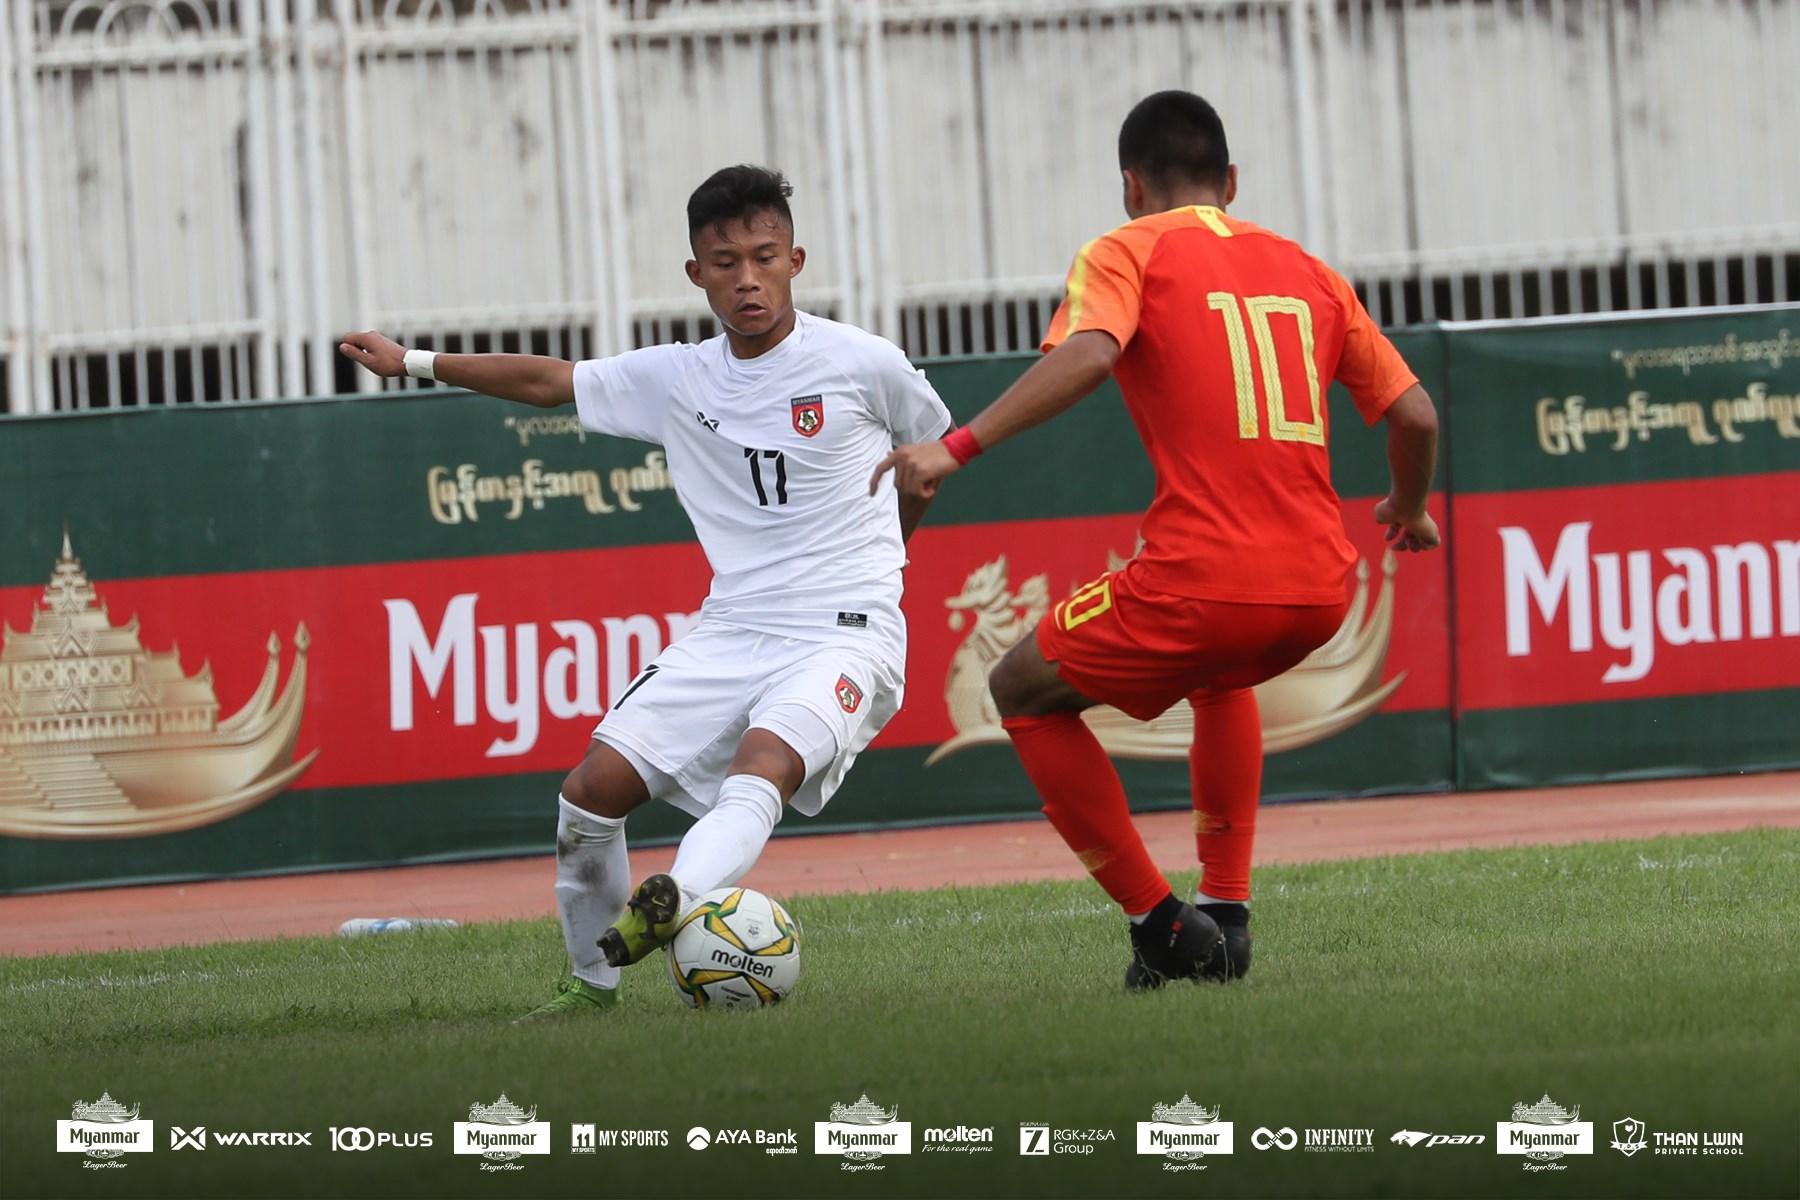 Myanmar team